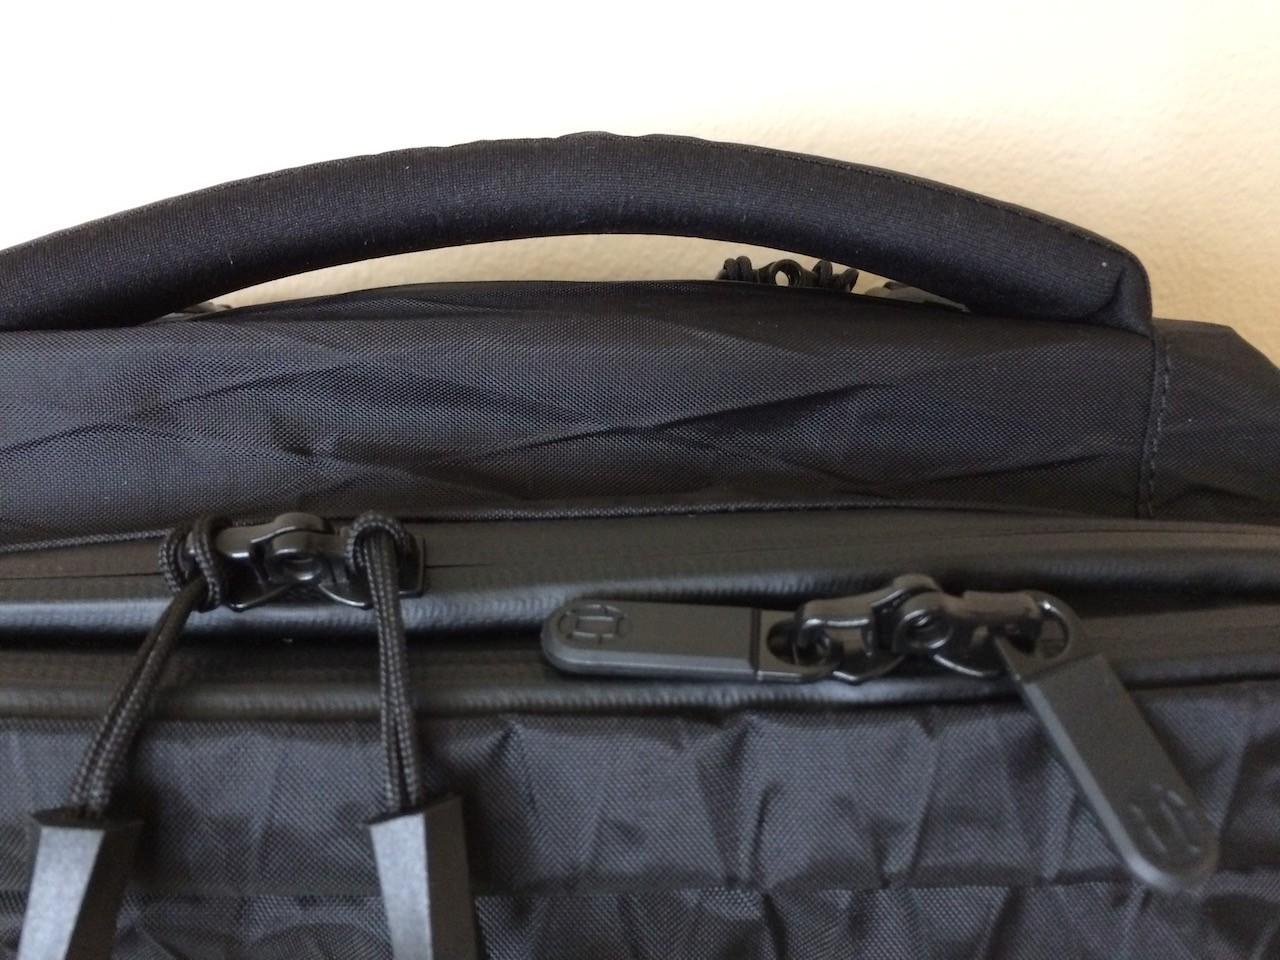 Tortuga Outbreaker Backpack locking zippers